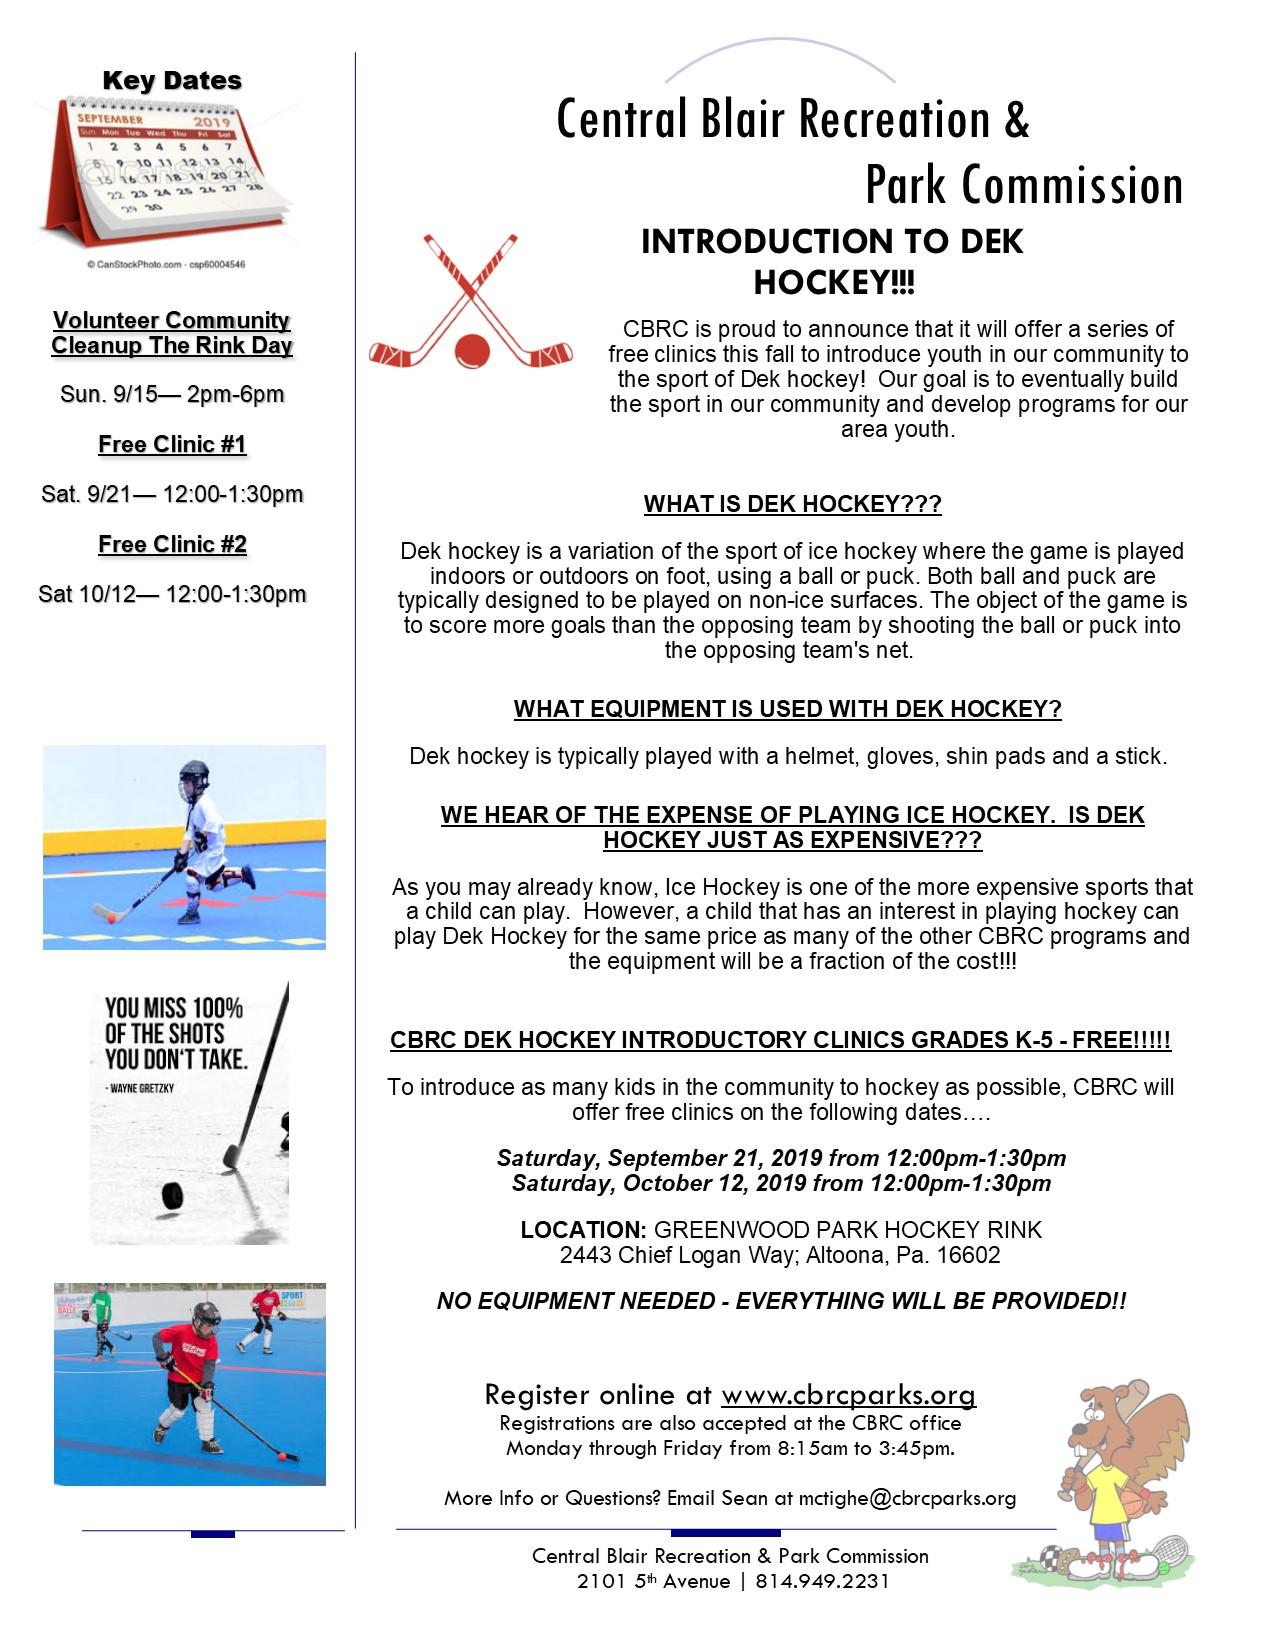 dek-hockey-free-clinics